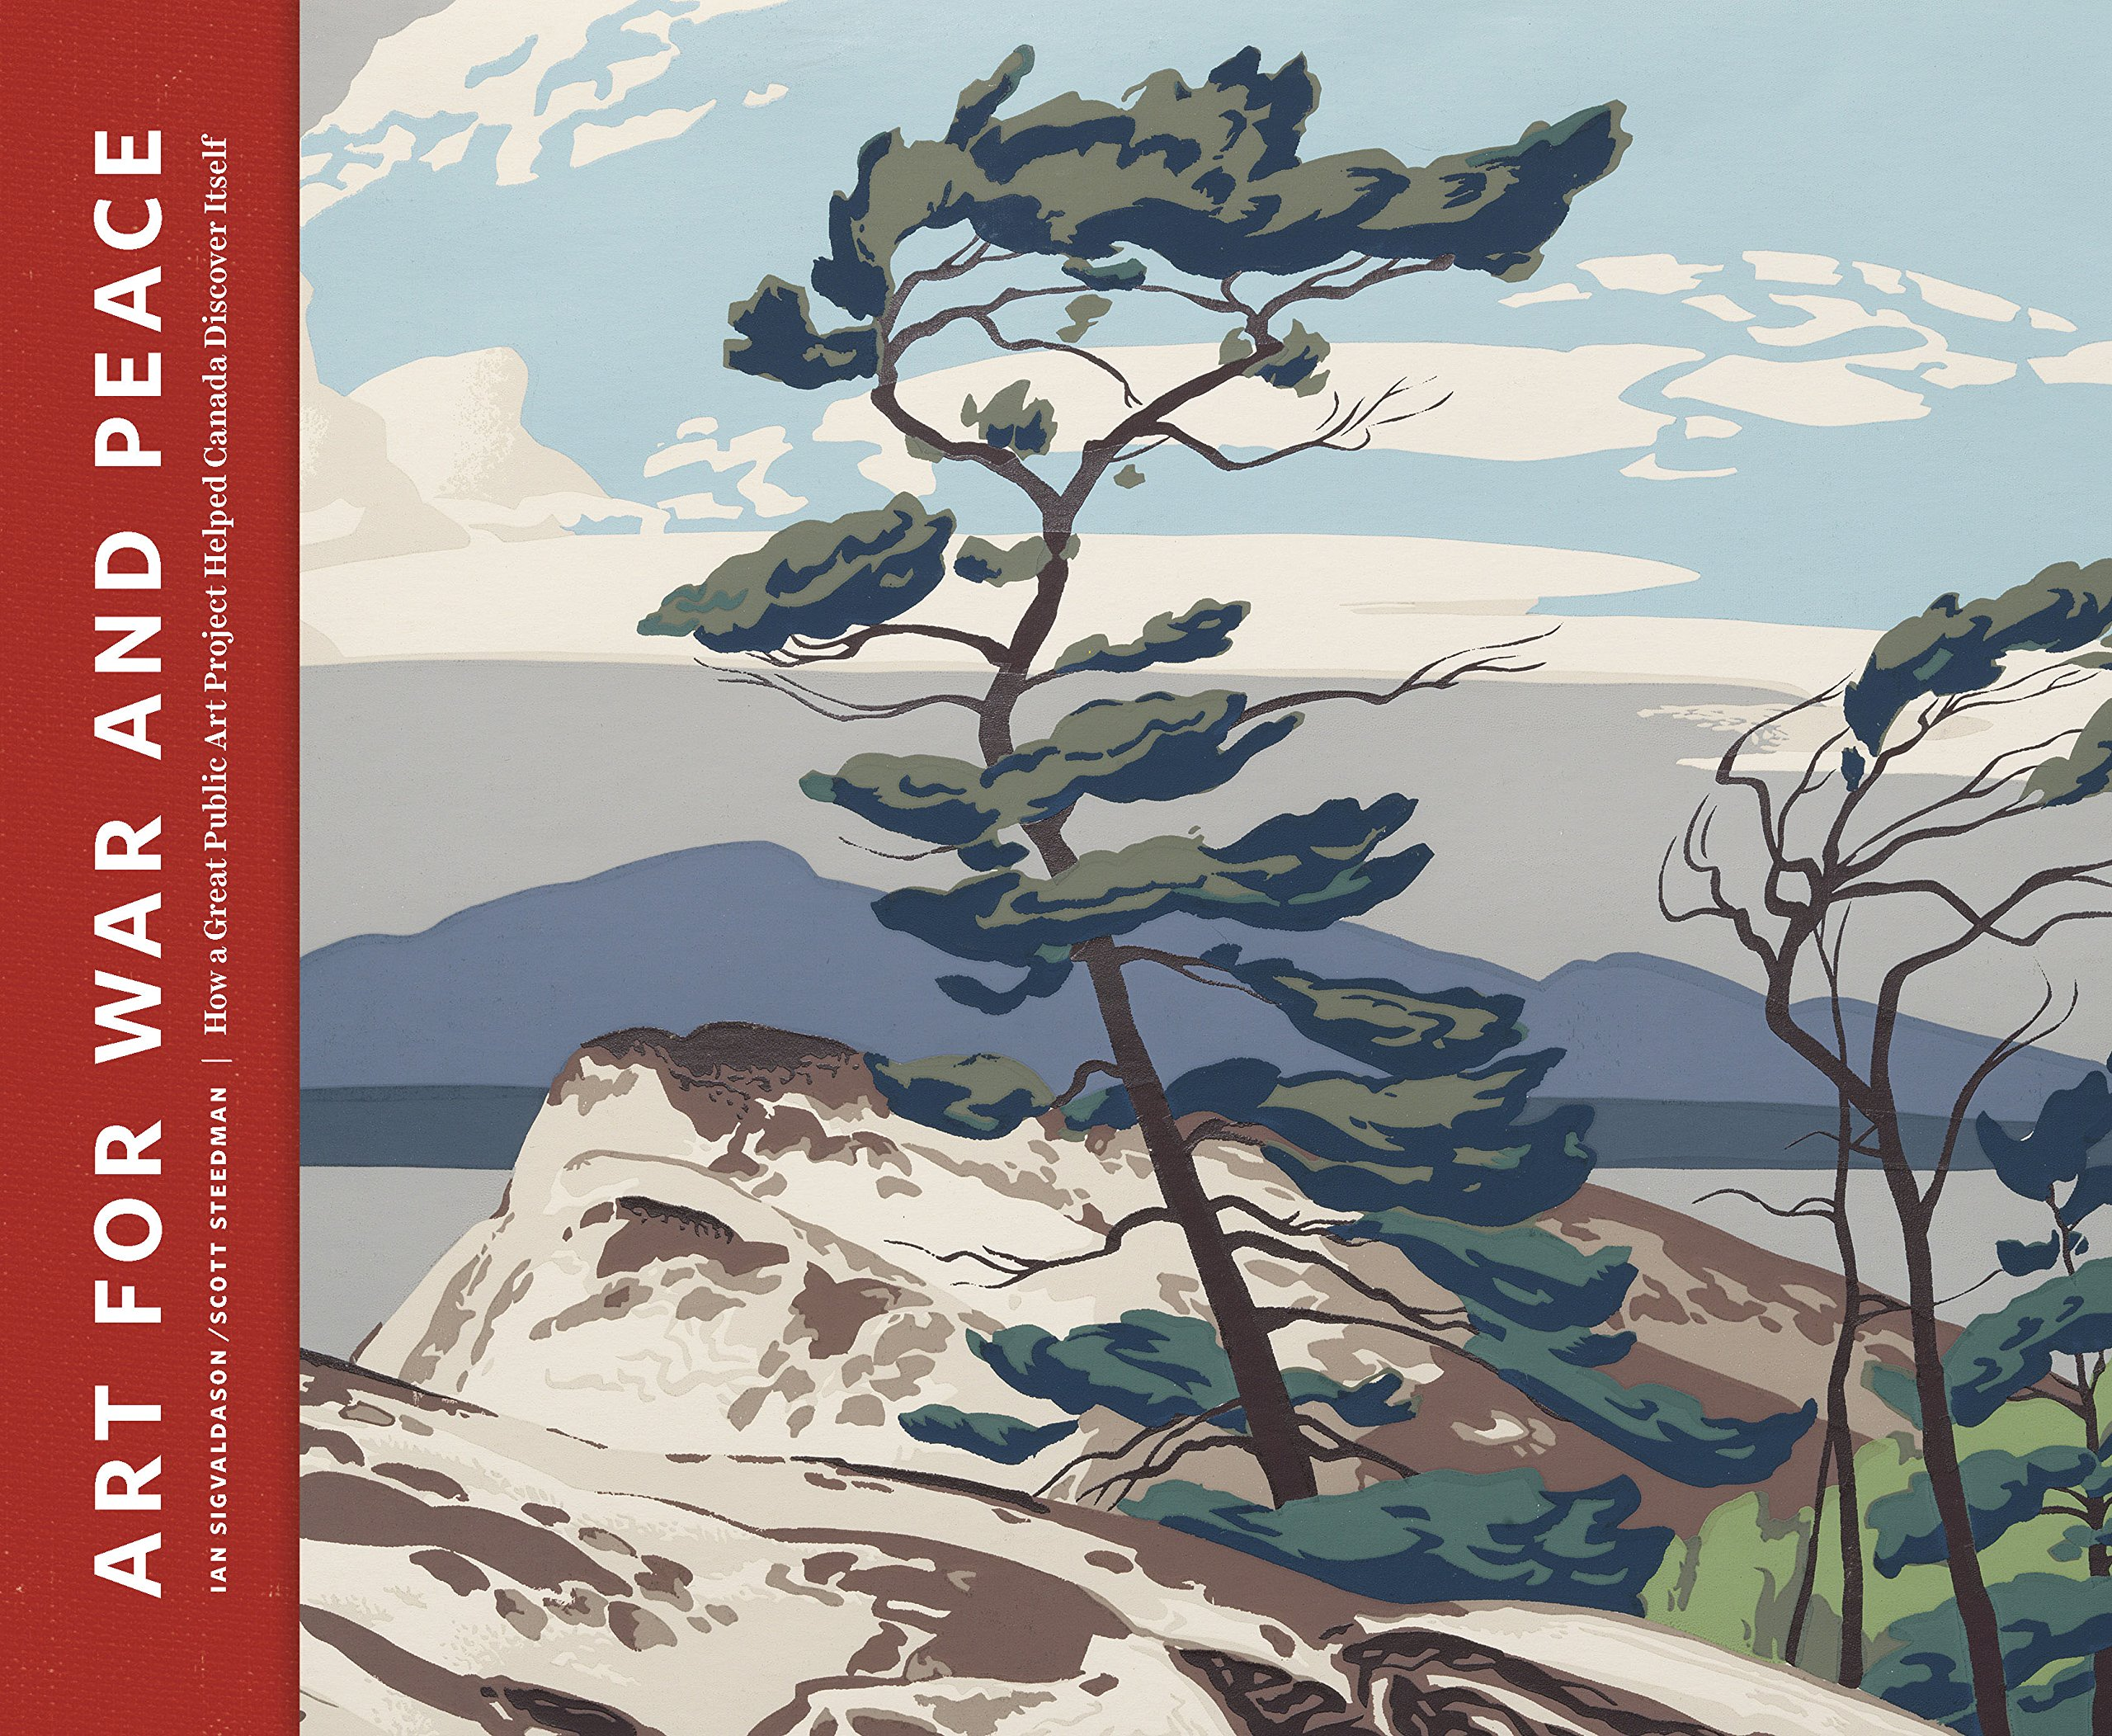 Art For War And Peace: How a Great Public Art Project Helped Canada Define Itself: Amazon.es: Sigvaldason, Ian, Steedman, Scott: Libros en idiomas extranjeros